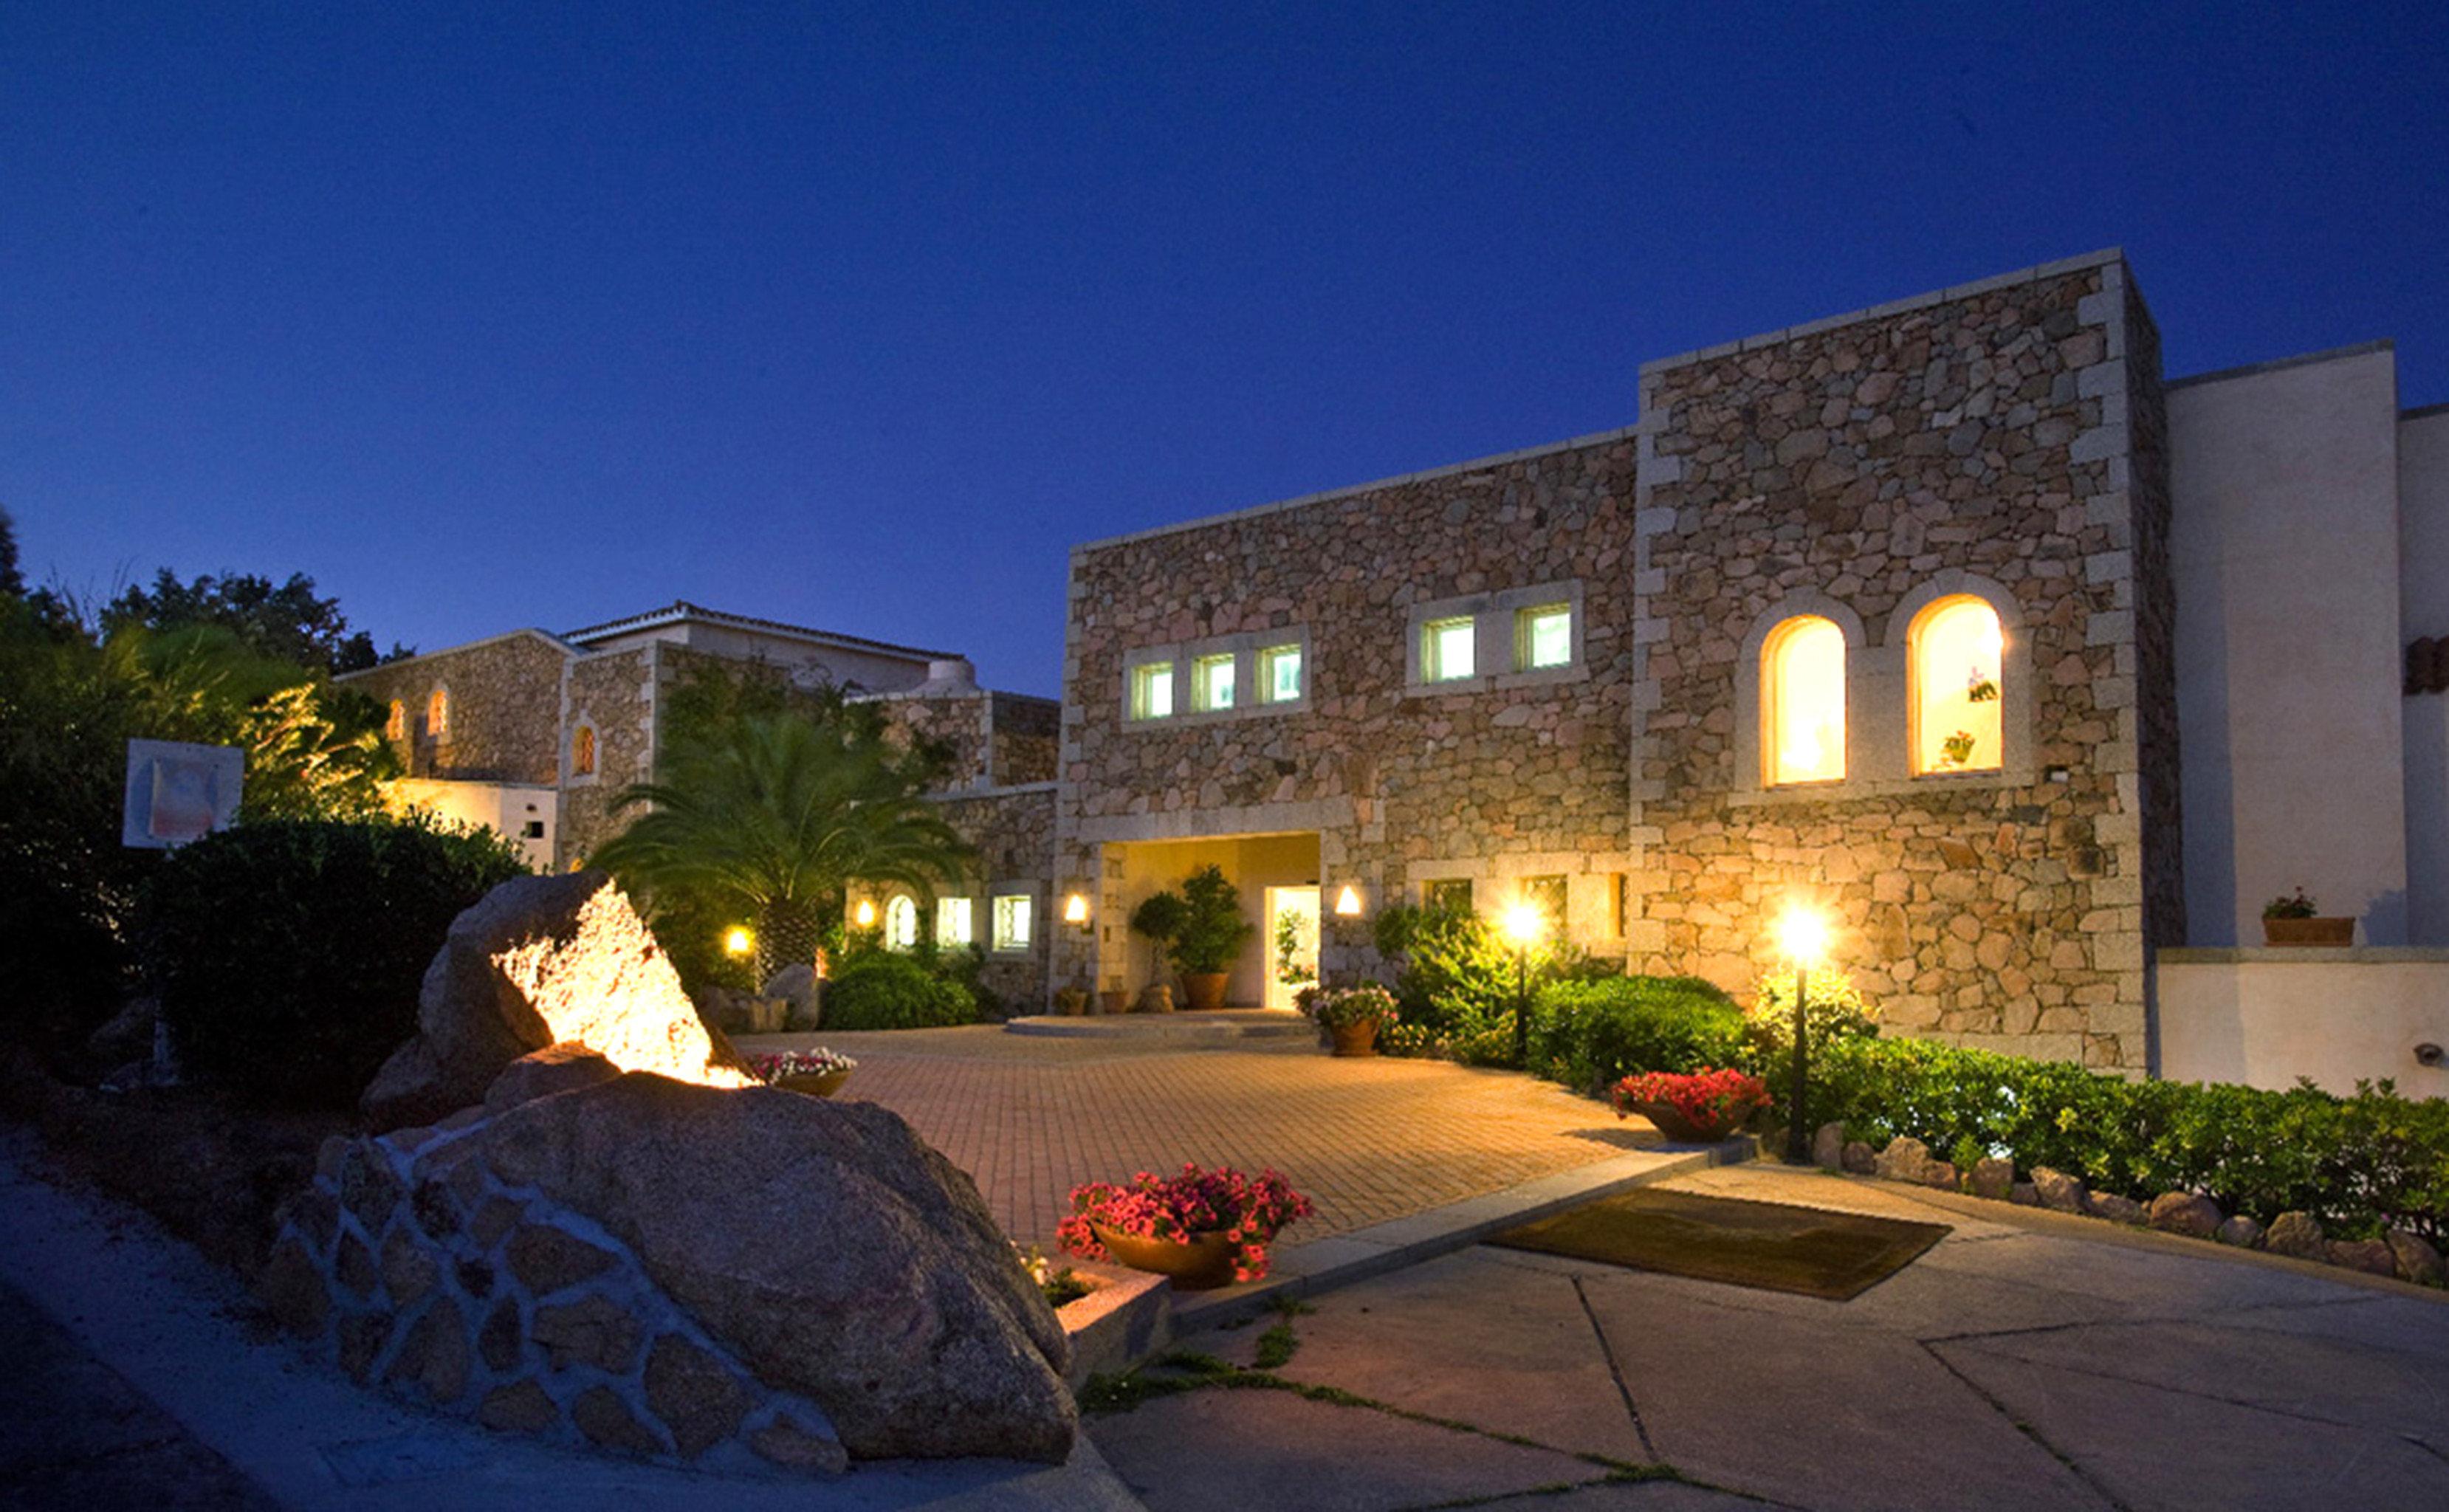 Elegant Exterior Luxury Romantic sky property house building Architecture home Resort Courtyard